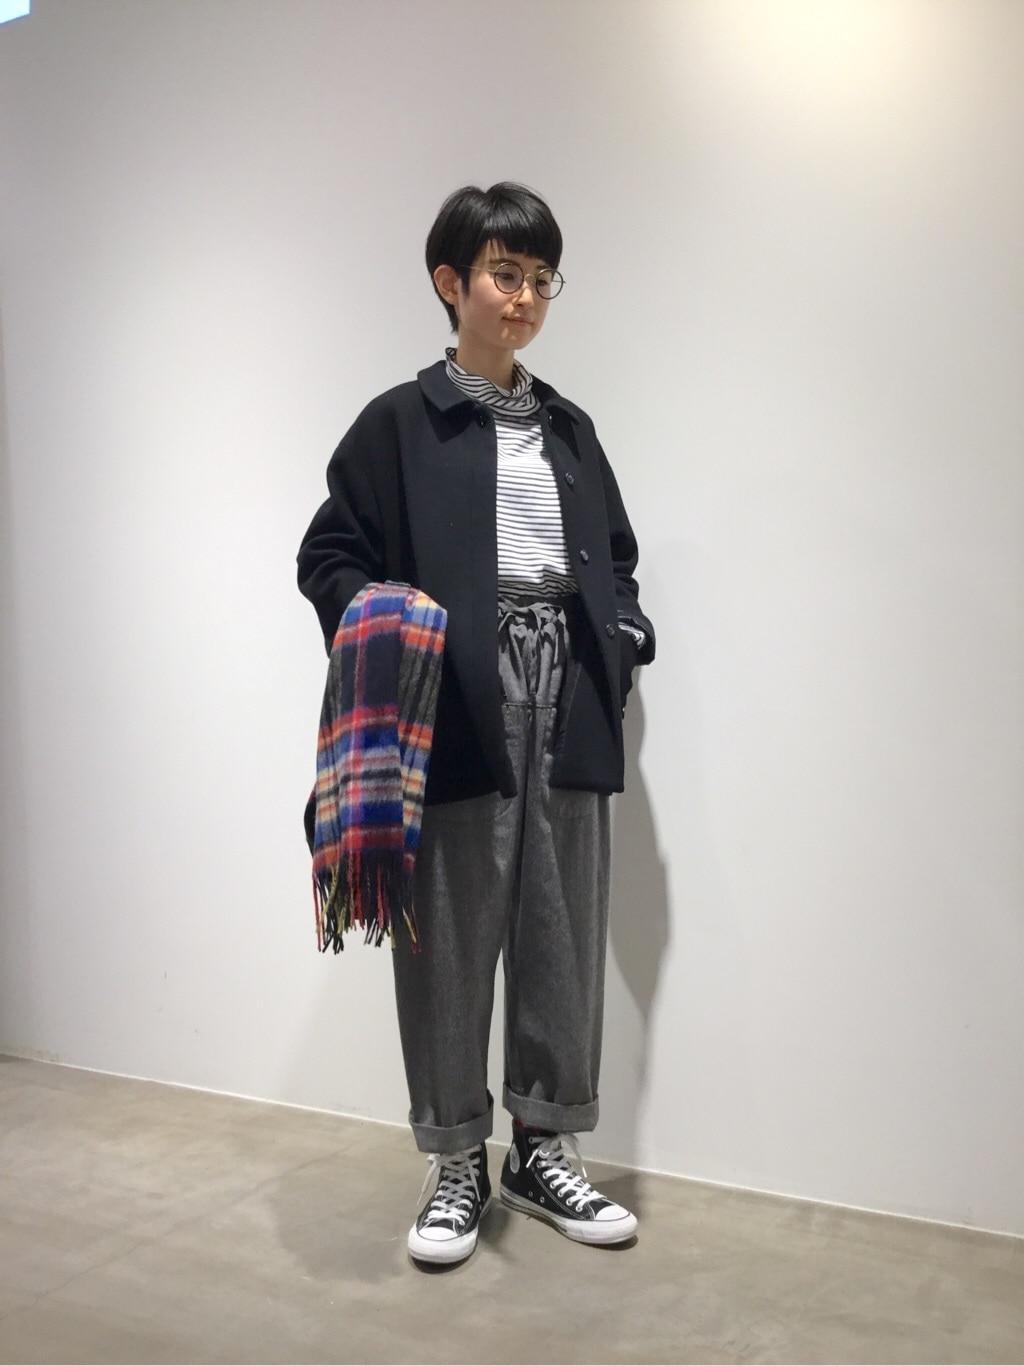 yuni / bulle de savon 京都路面 身長:159cm 2020.10.19